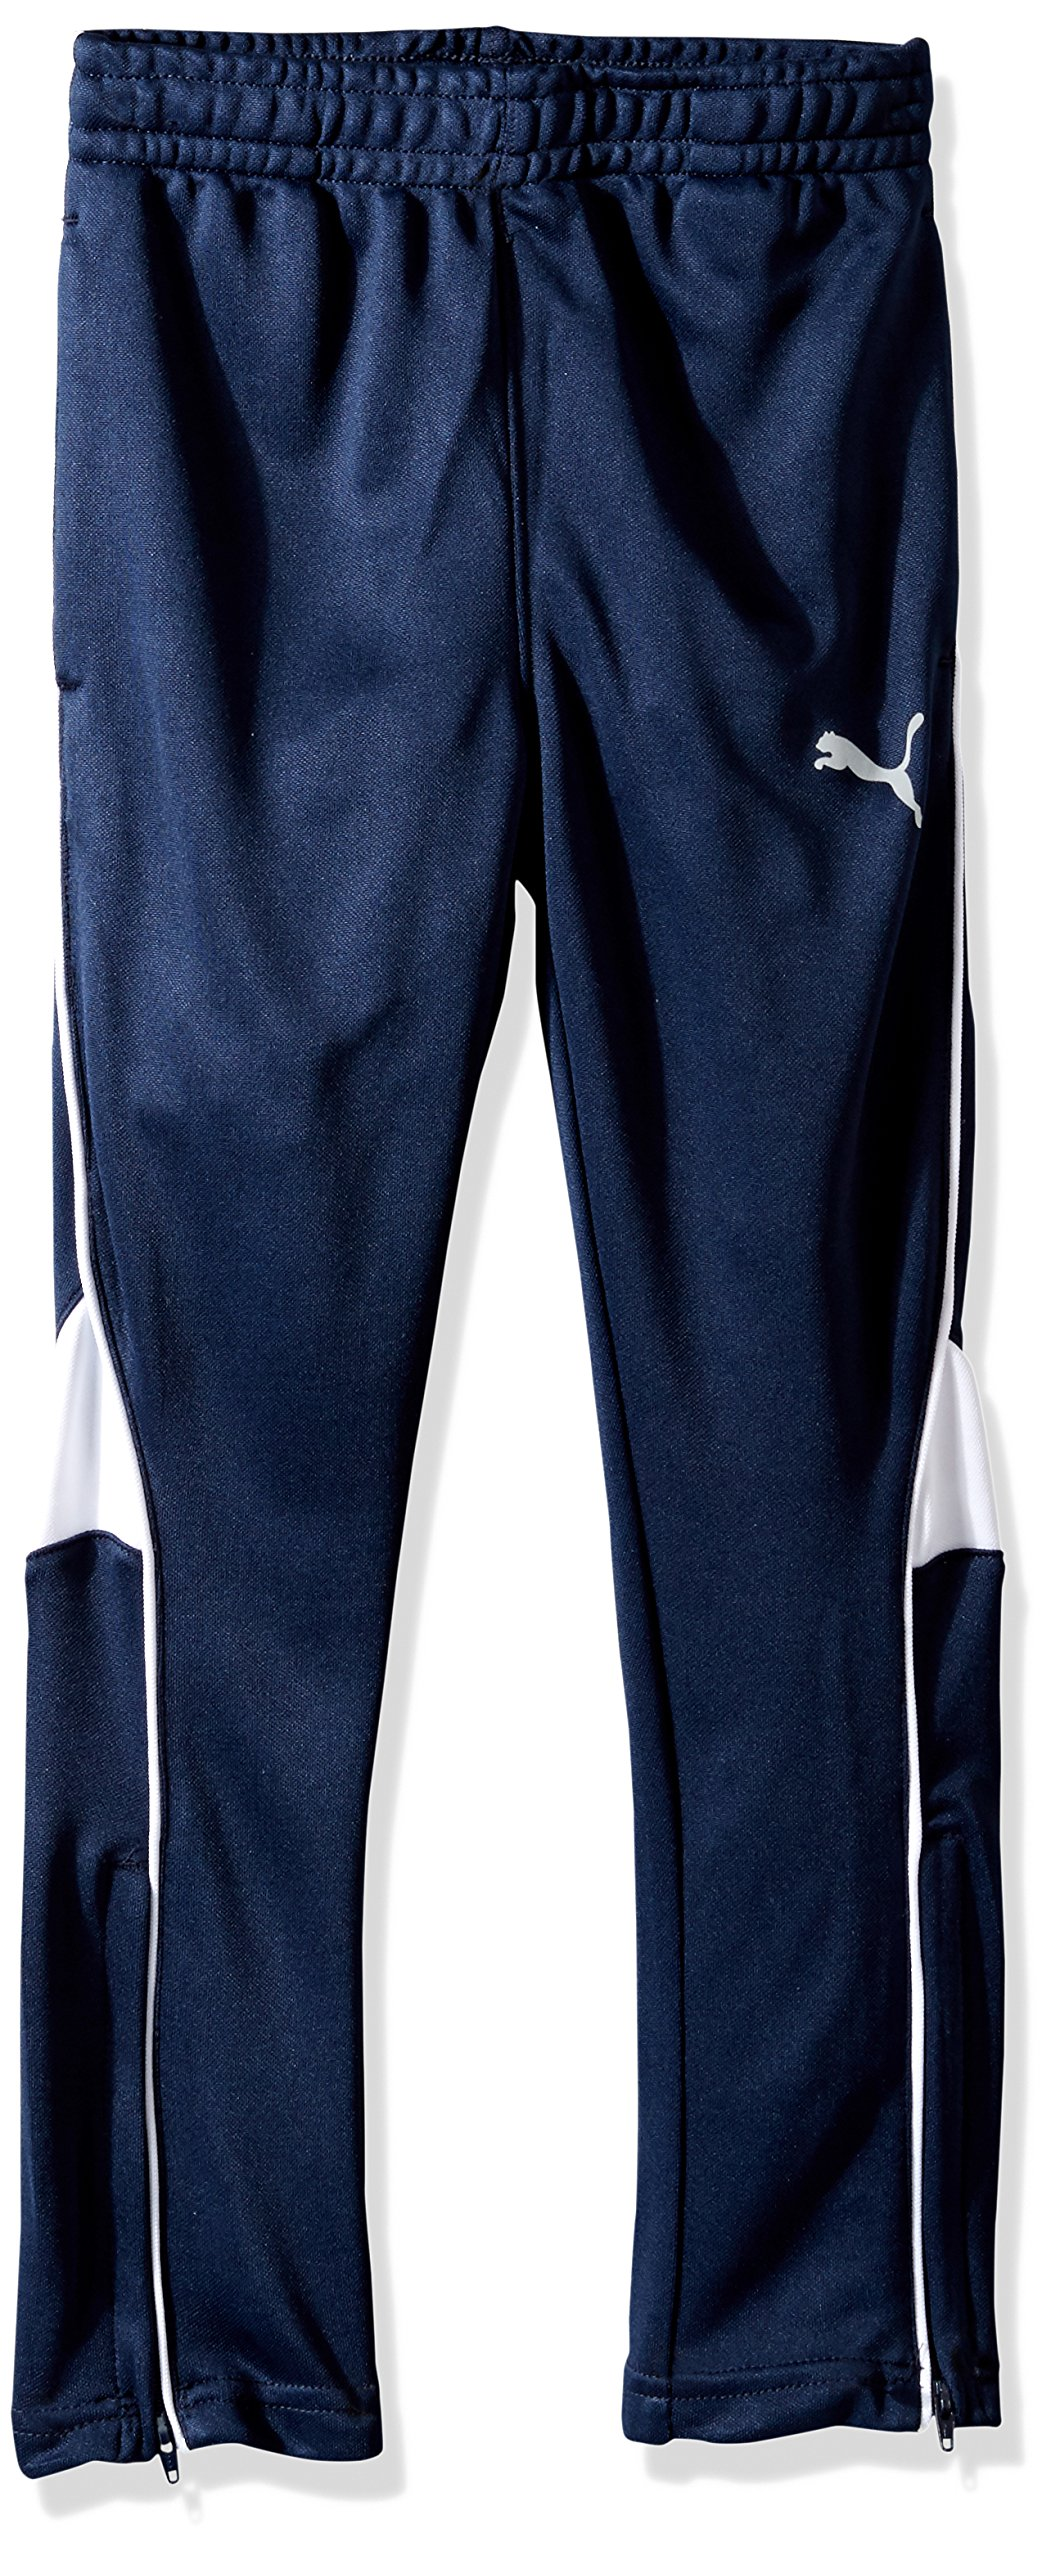 PUMA Little Boys' Soccer Pant, Deep Navy, 5